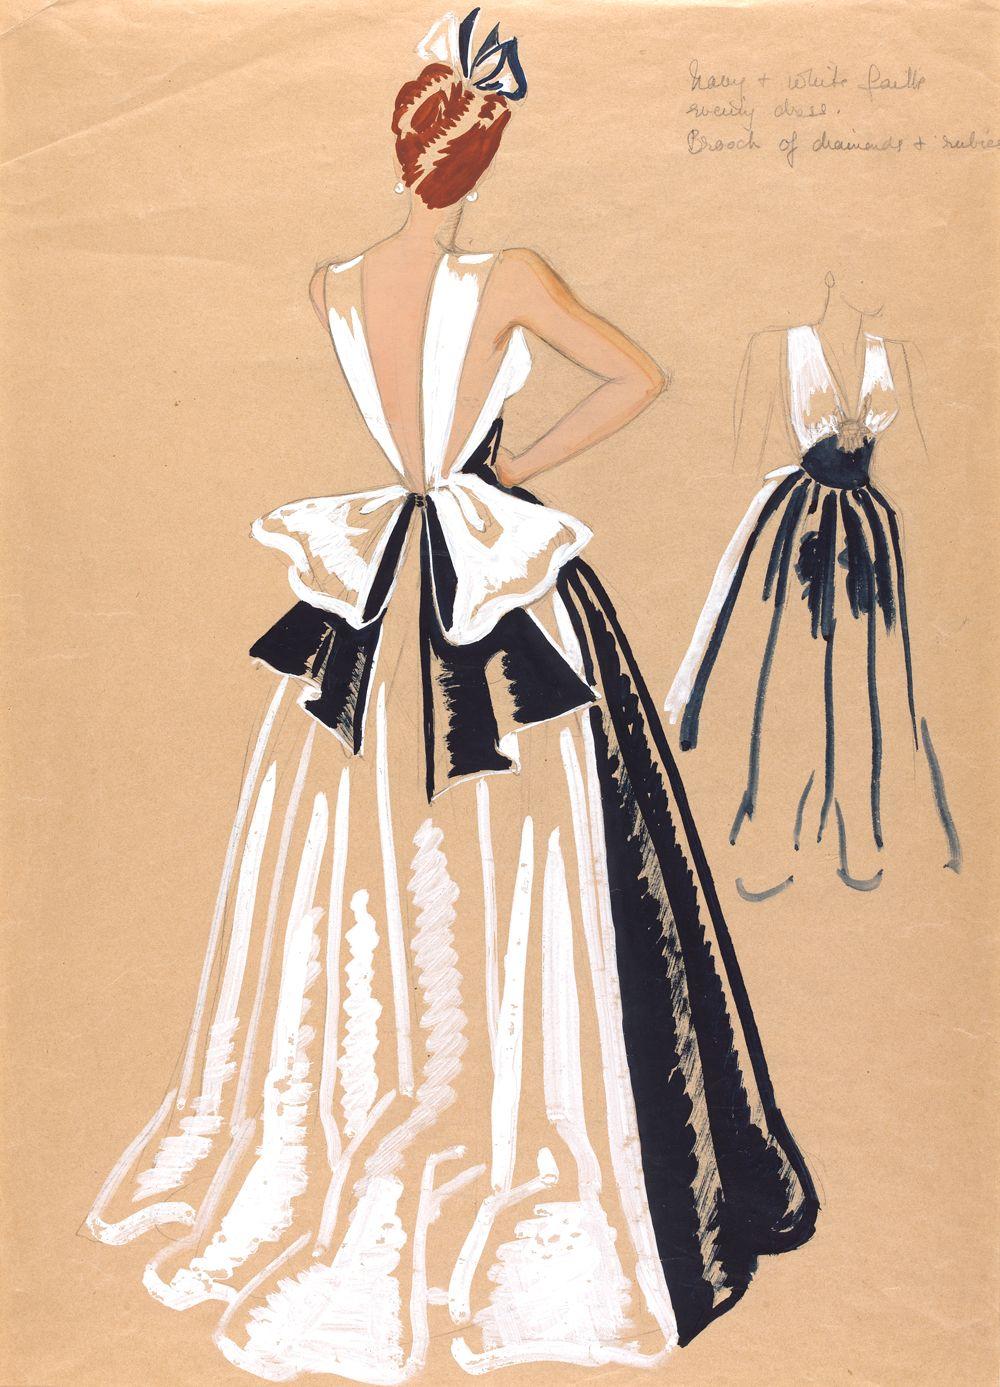 Interpreting Narrative 1940 S Fashion Designers Fashion Drawing 1940s Fashion Liberty Fashion